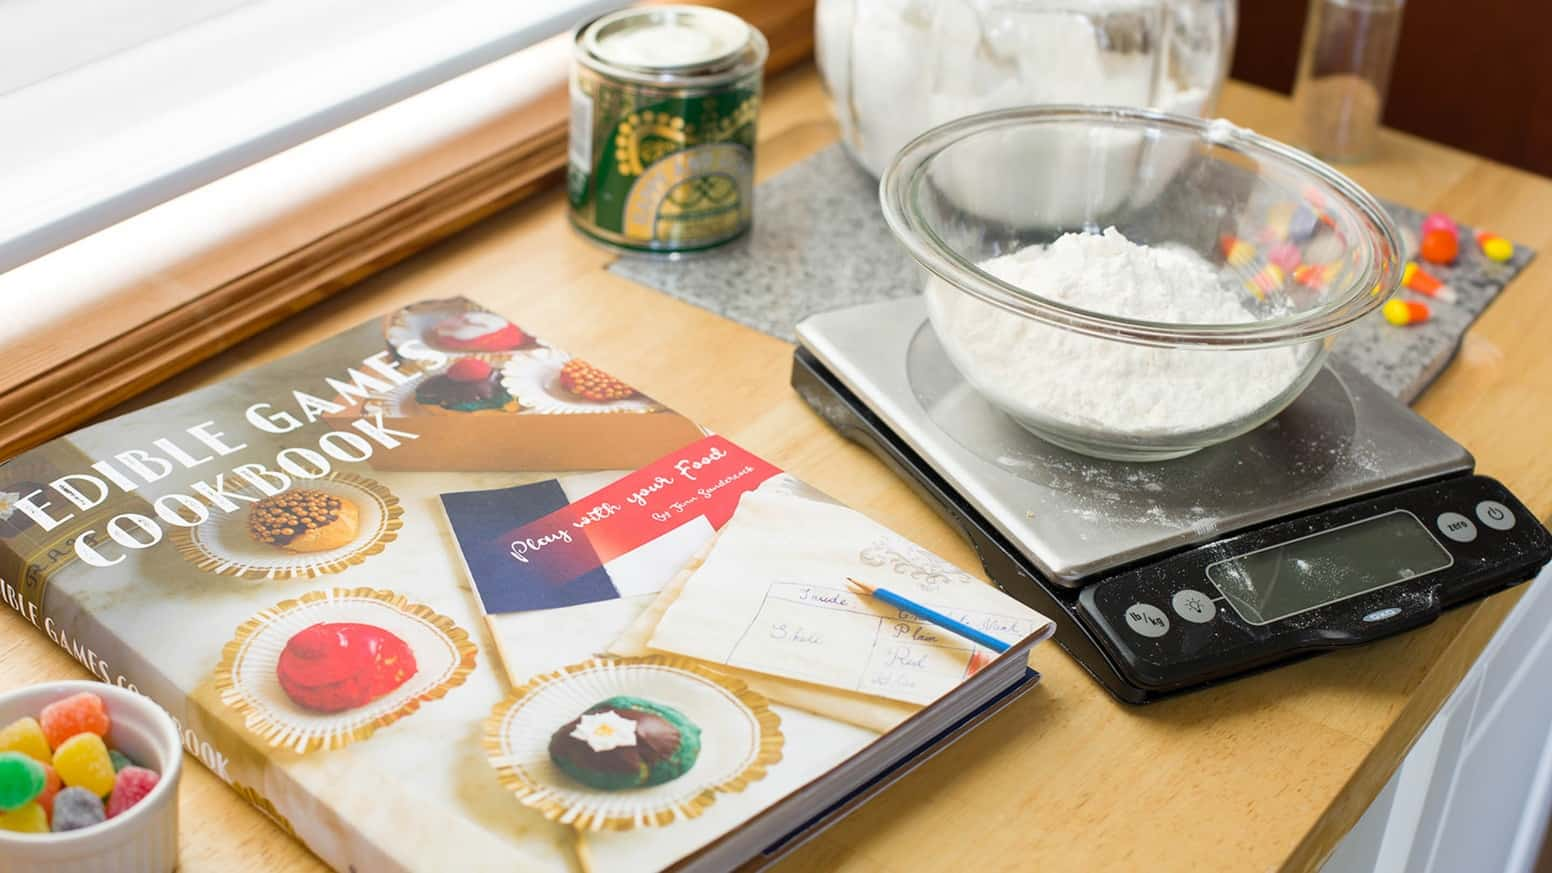 Edible Games Cookbook